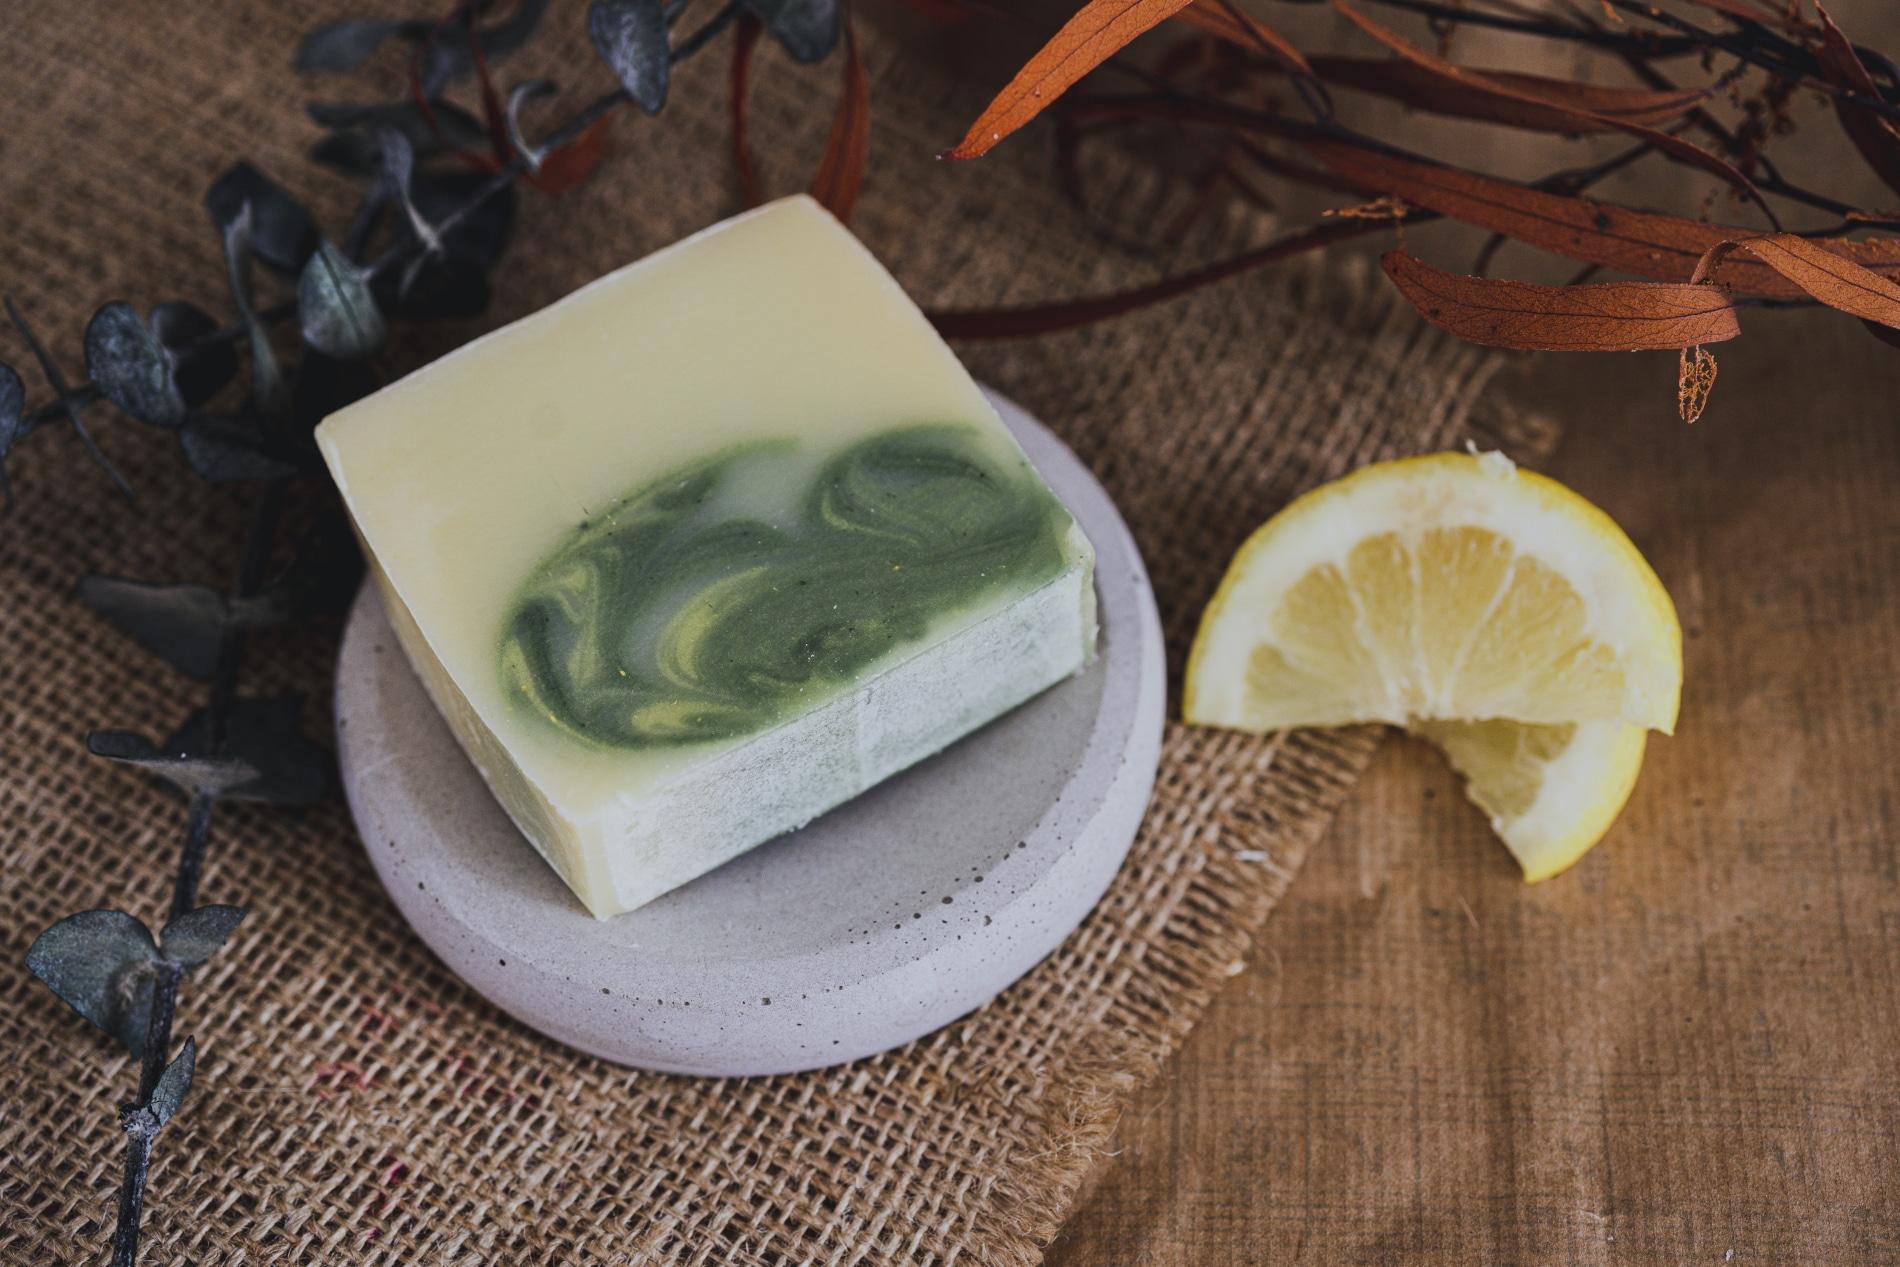 savon-verveine-eucalyptus-citronne-percé-verre